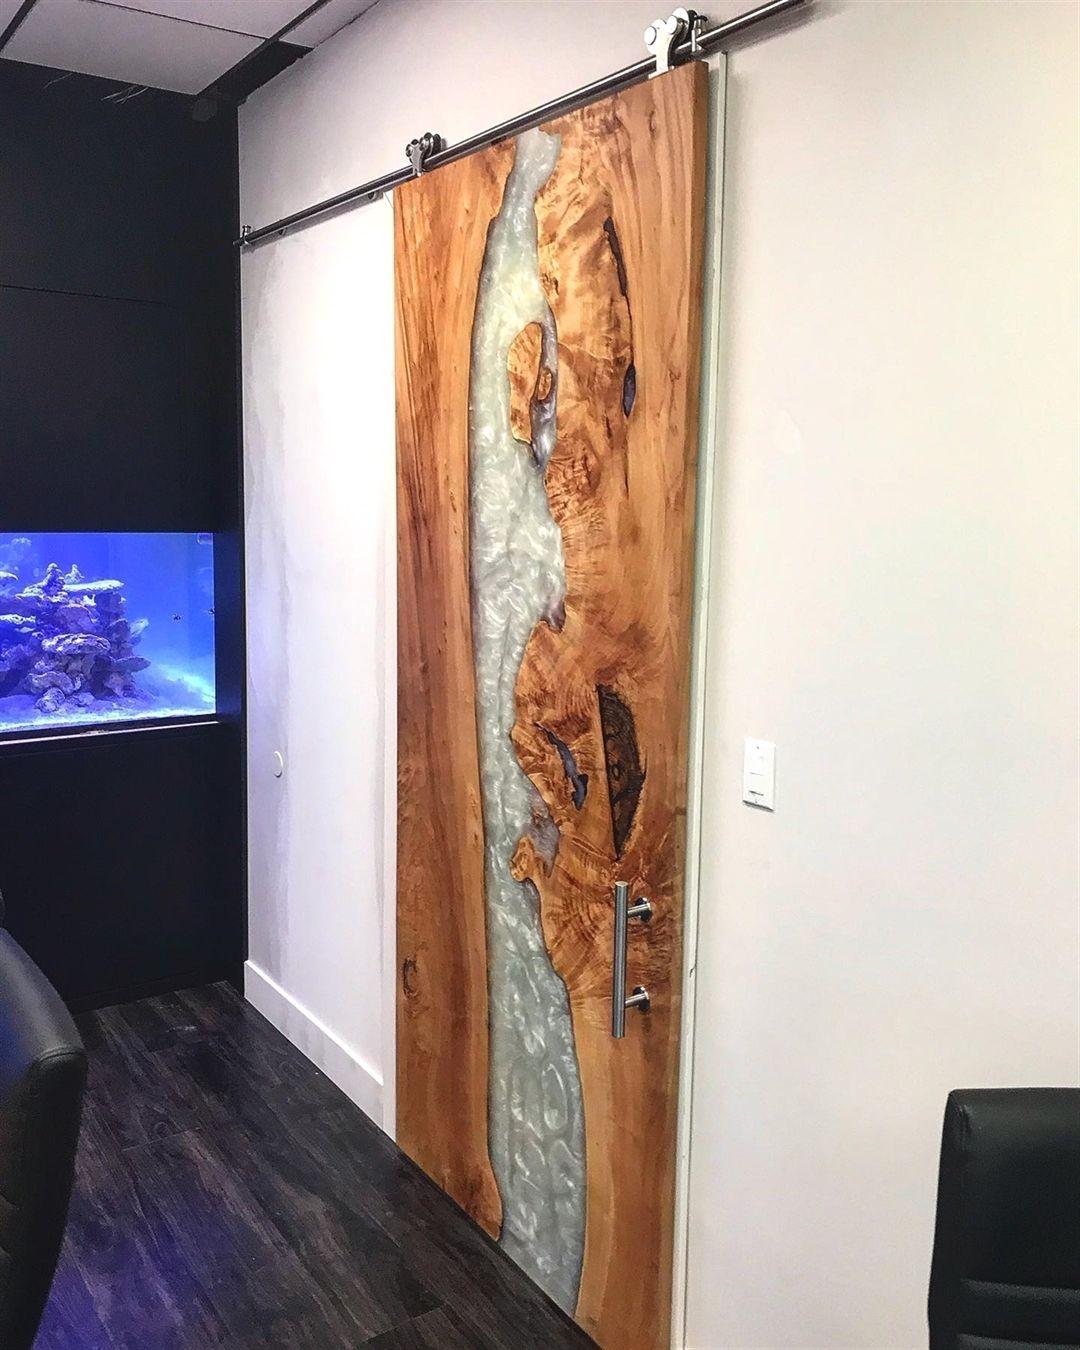 Follow Woodworkingsocial For More Wonderful Wood Working Yes It S A River Door Credit Rustic Desig Barn Door Designs Wood Wall Design Wood Doors Interior